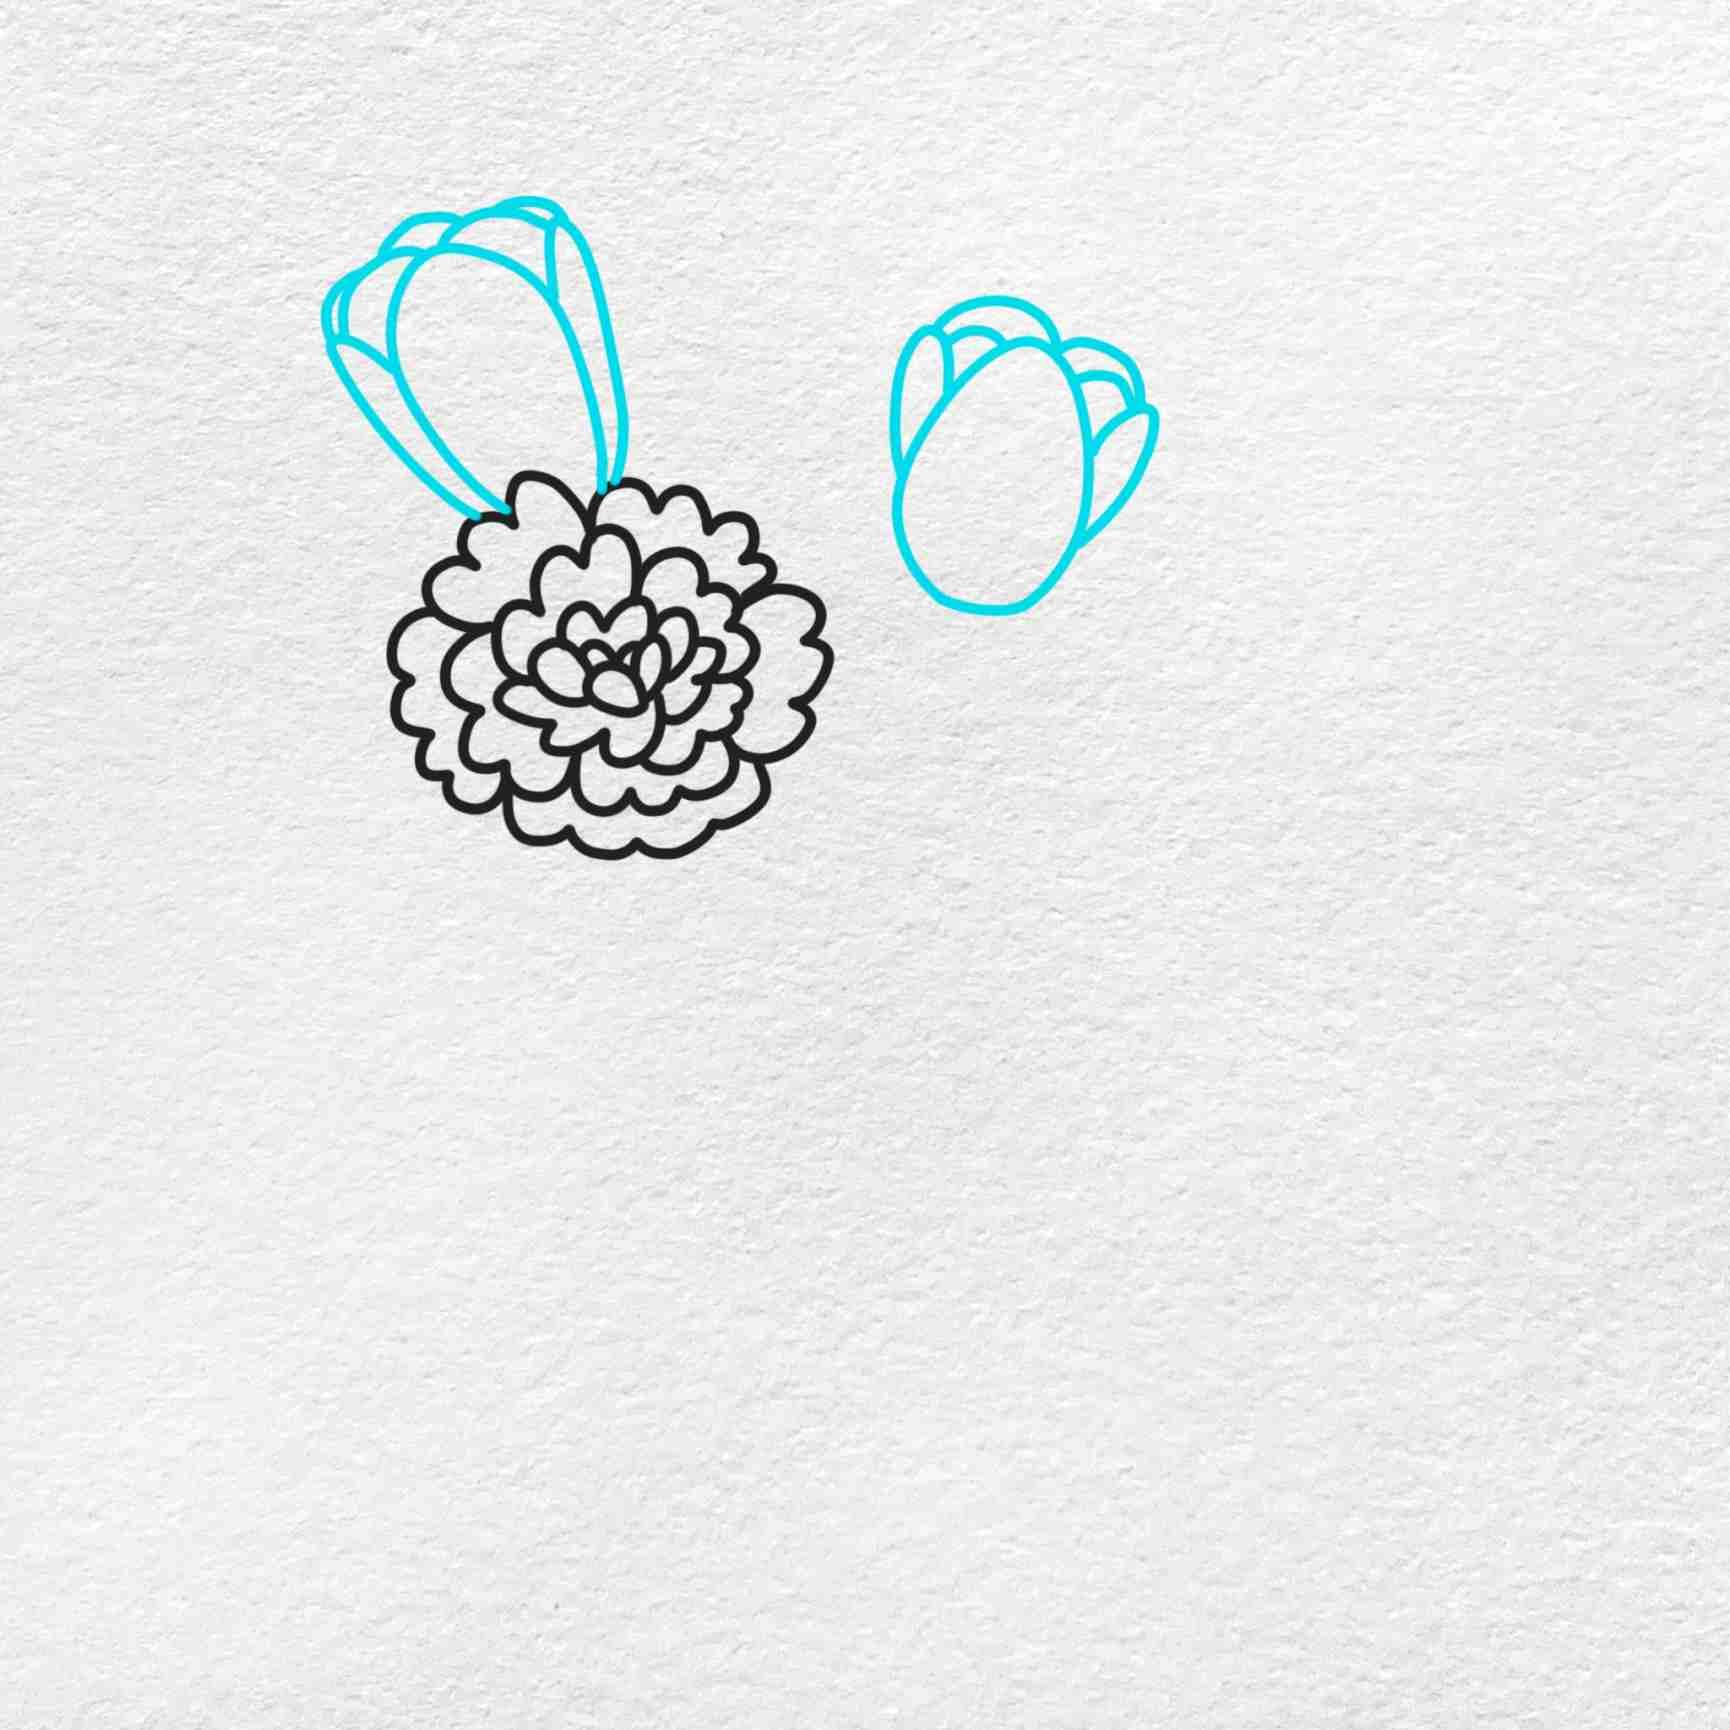 Spring Flowers Drawing: Step 2